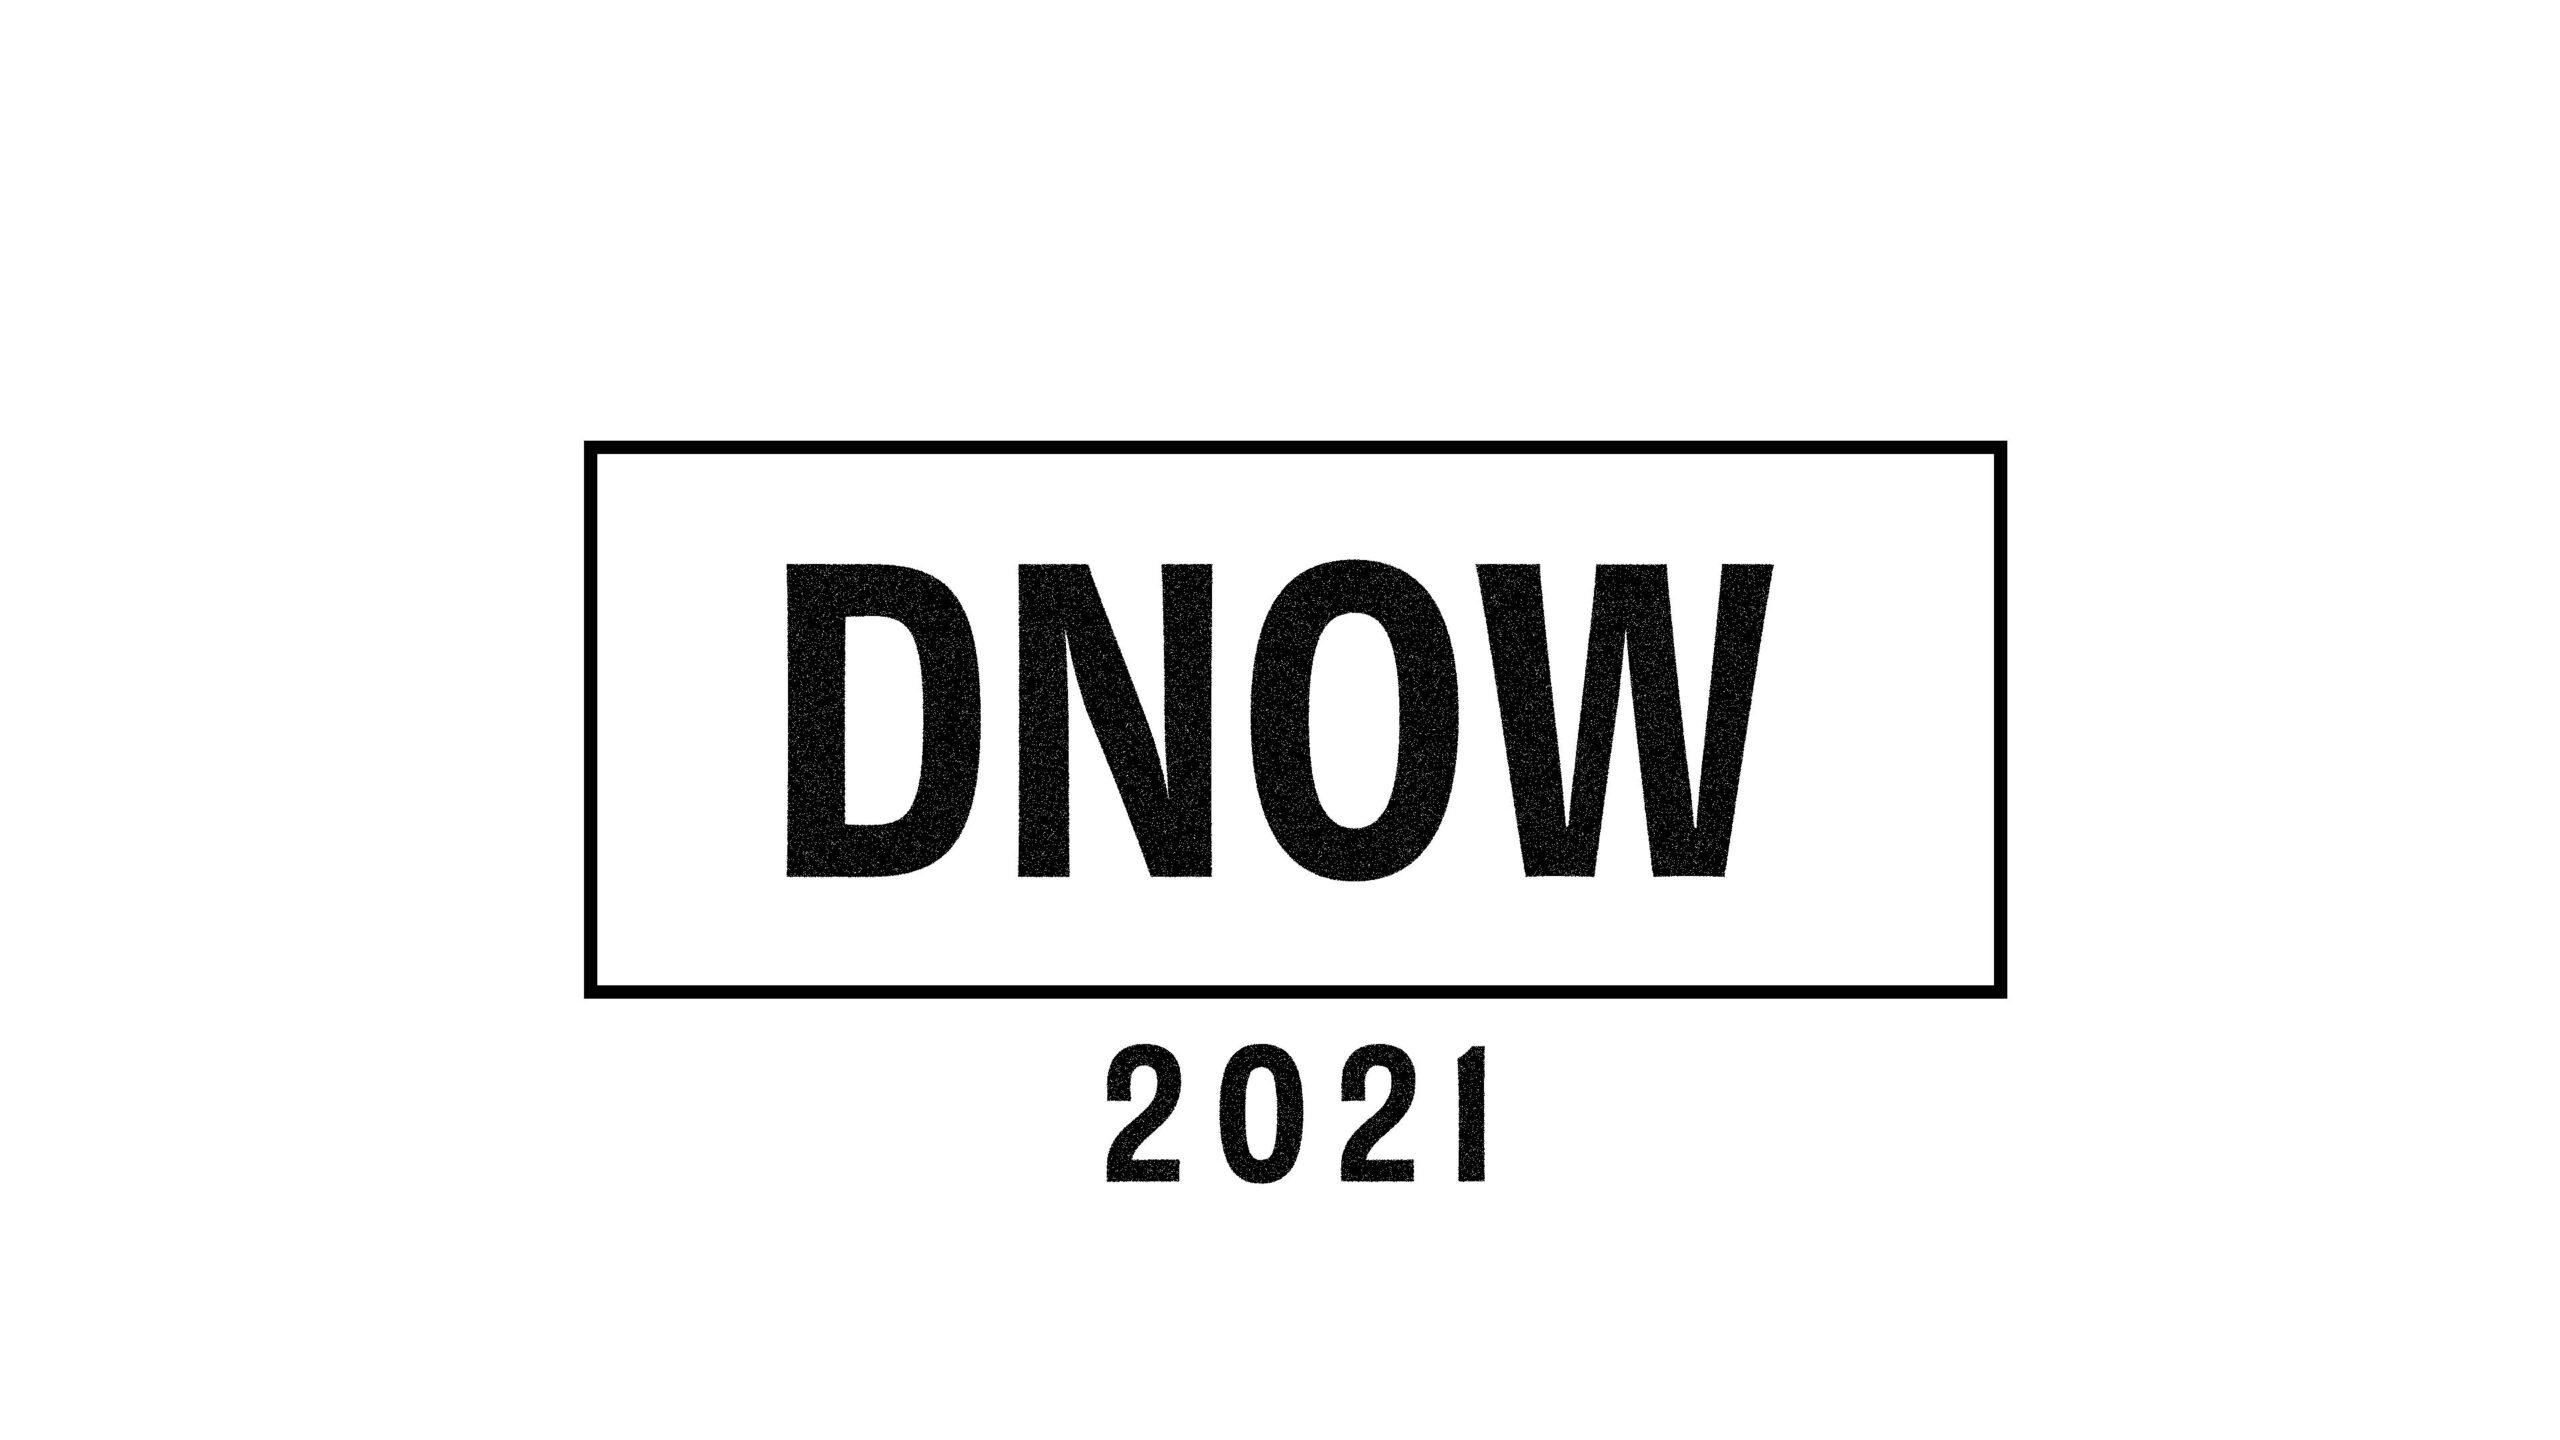 Dnow 2021 bulletin graphic scaled original